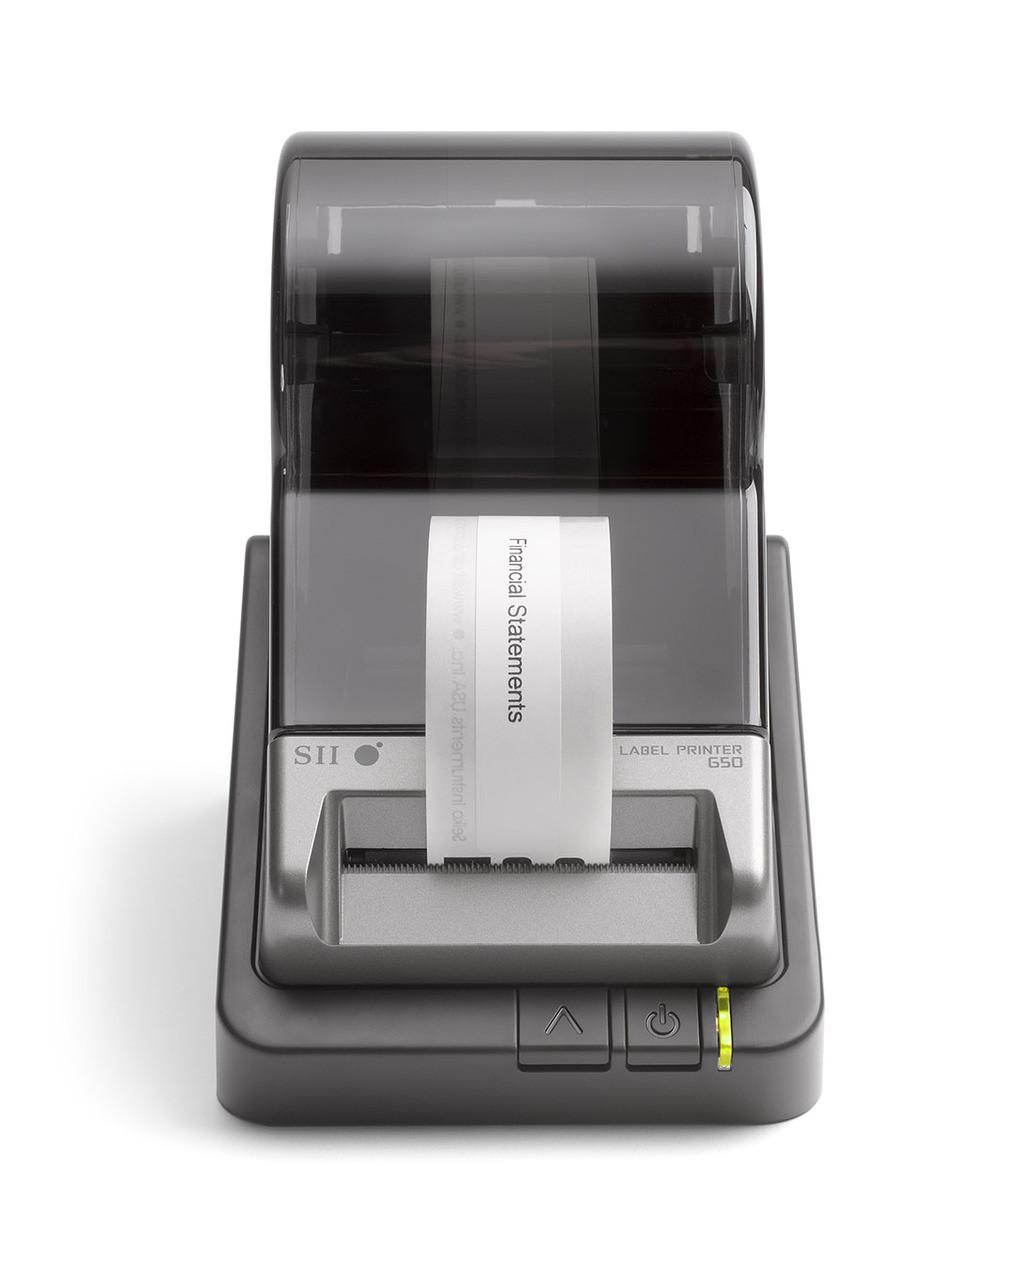 Seiko Smart Label Printer 650 Label Printers